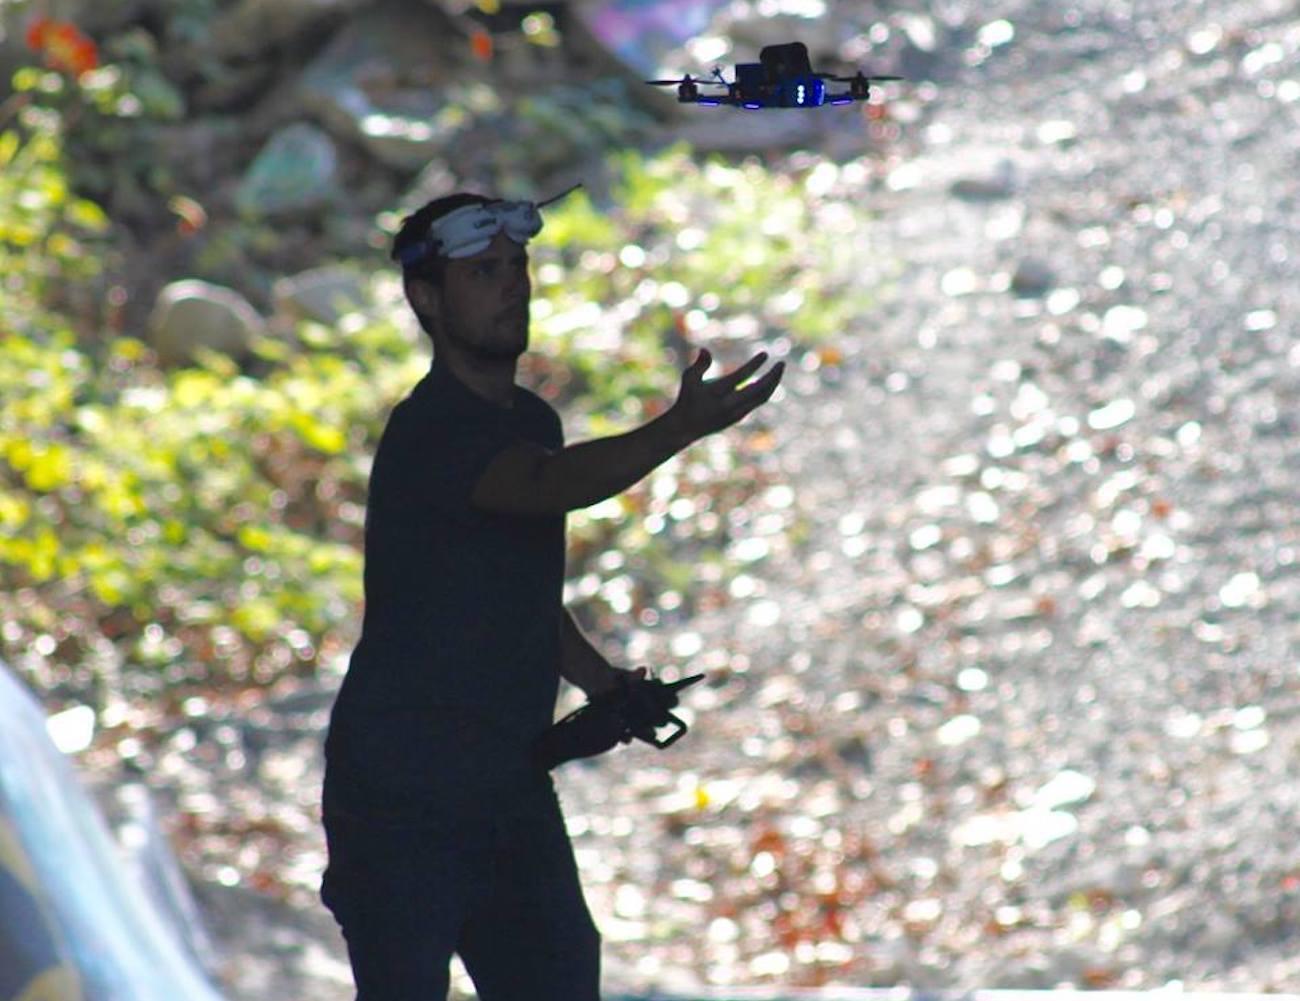 UVify Draco High-Speed Drone